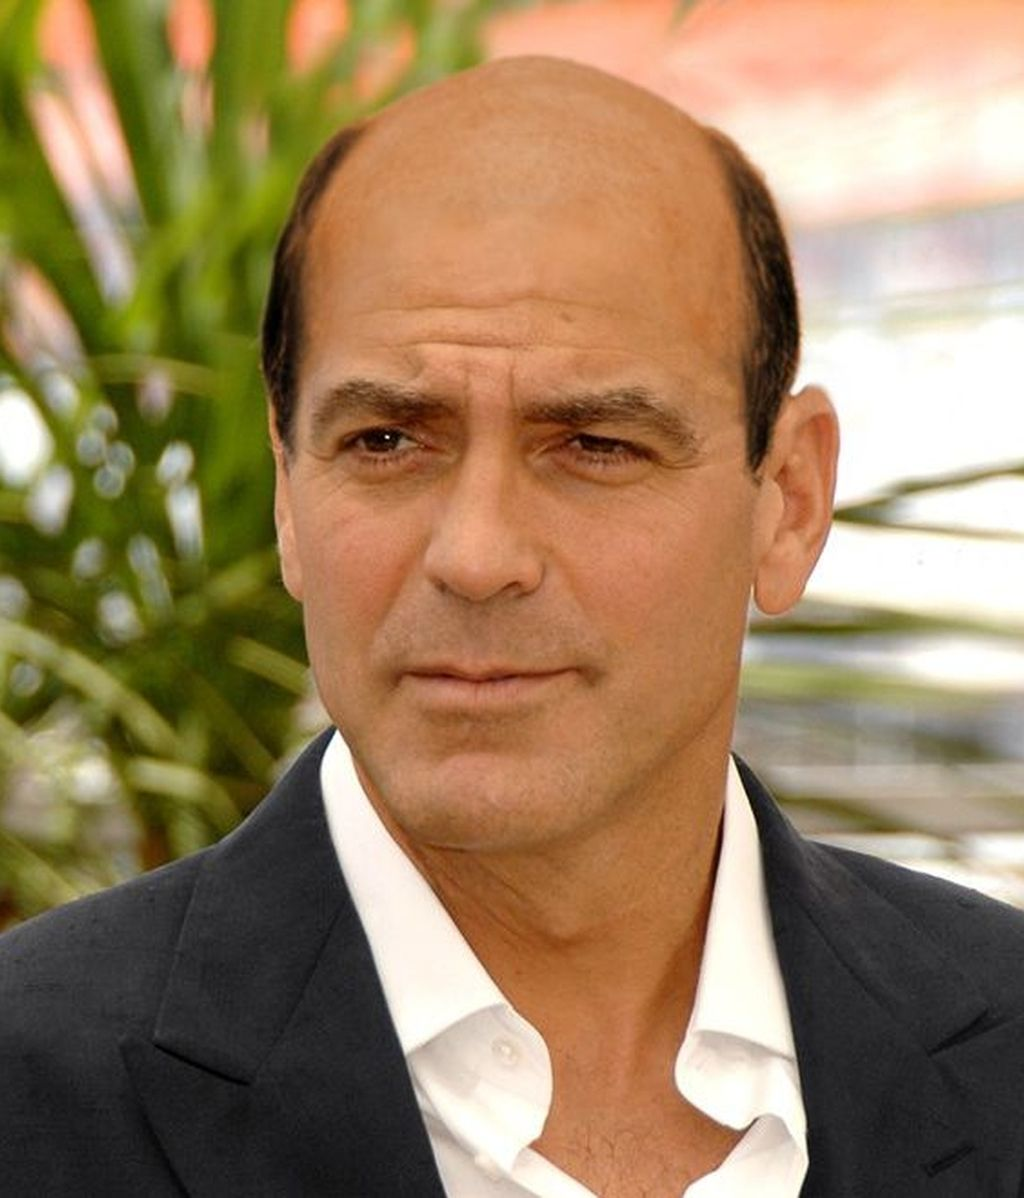 Imagina a George Clooney